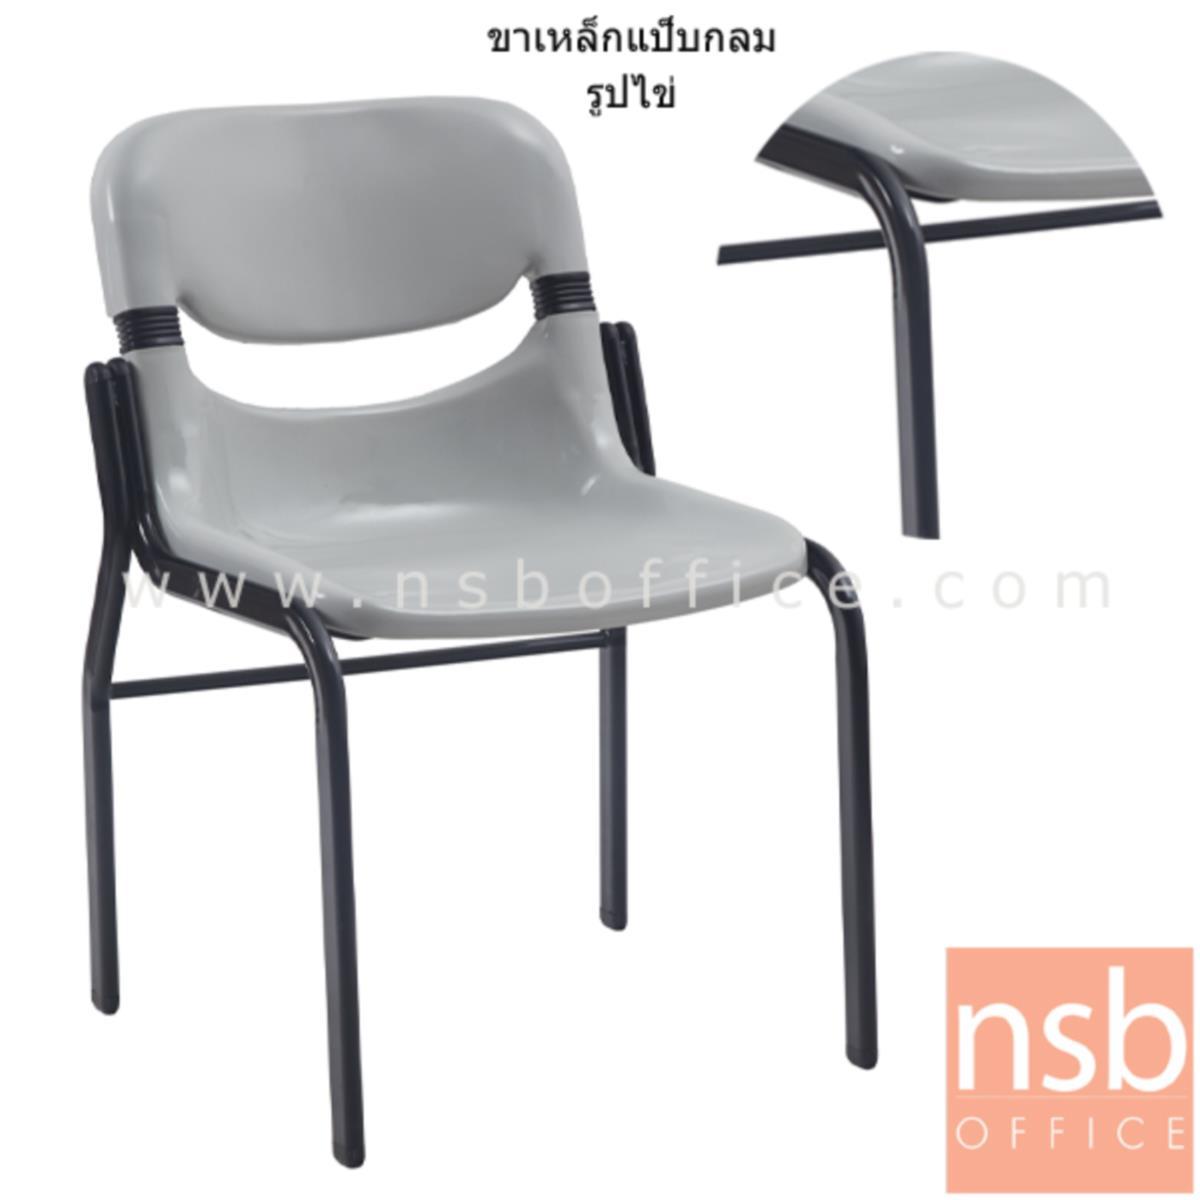 B05A035:เก้าอี้อเนกประสงค์เฟรมโพลี่ รุ่น A790  ขาเหล็ก